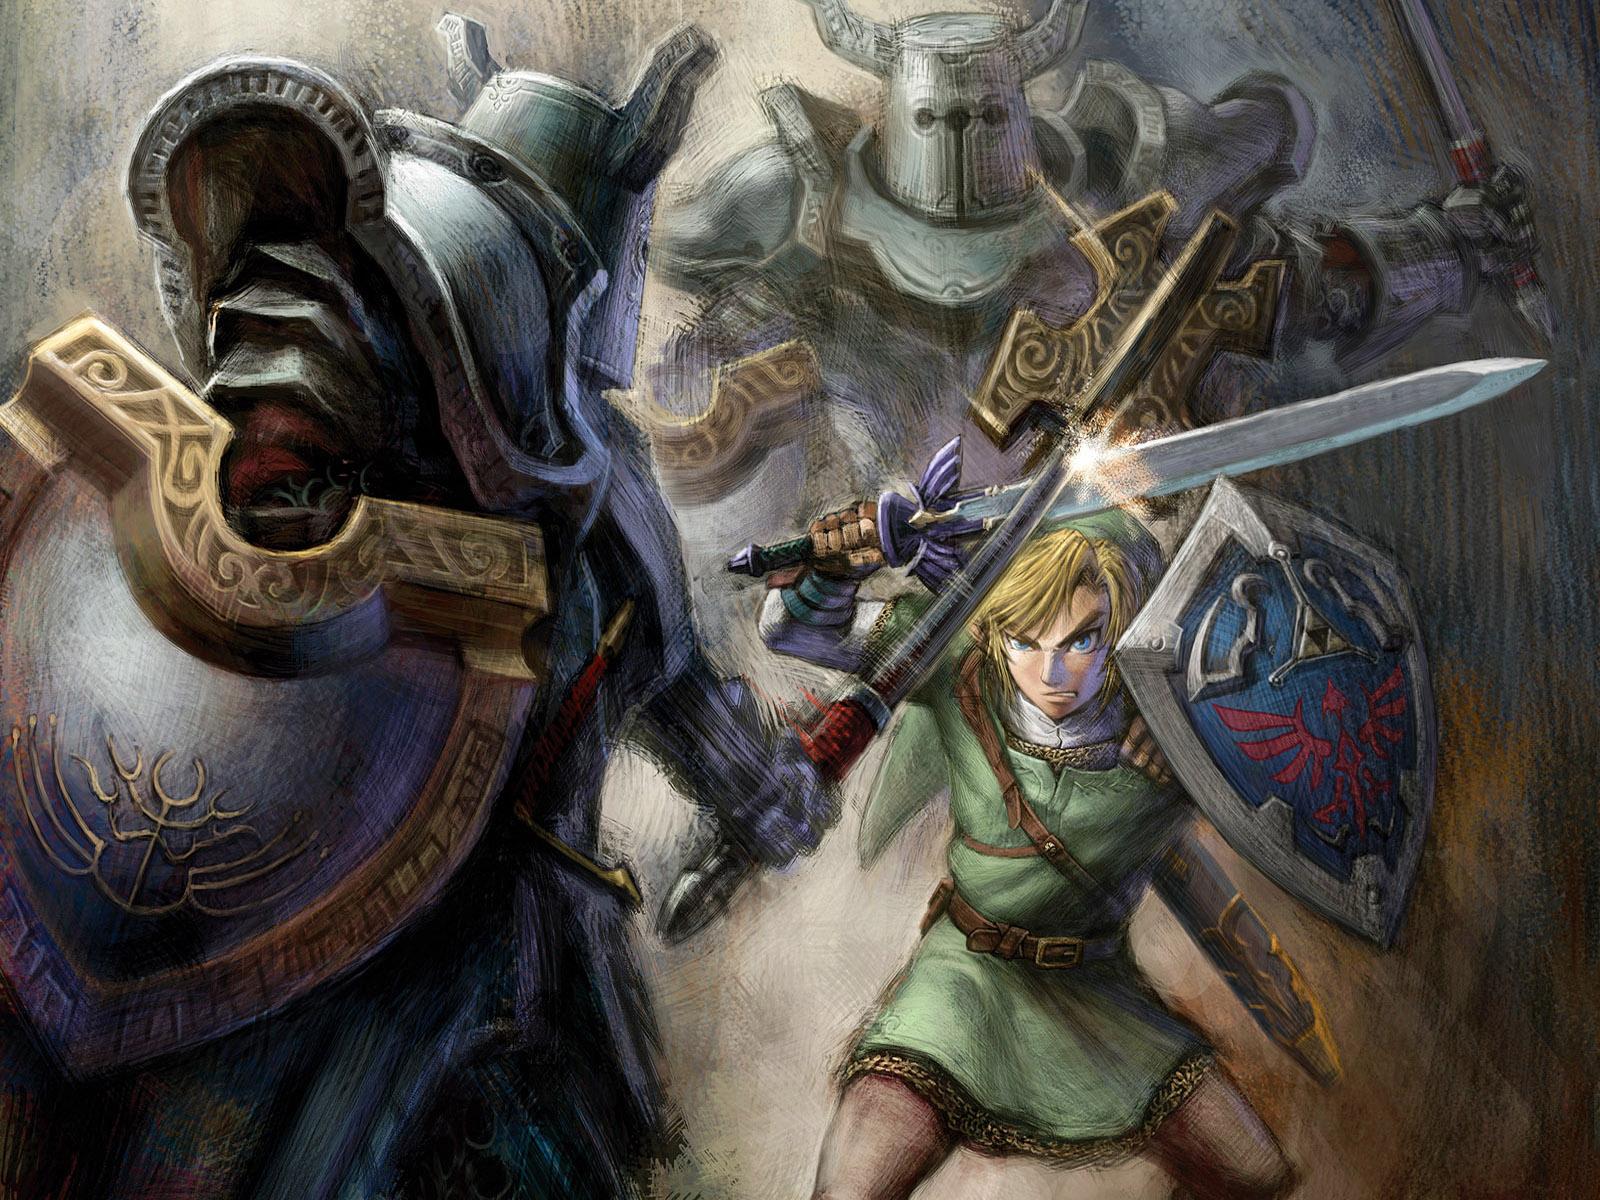 Mega Wallpapers HD: The Legend of Zelda Wallpaper